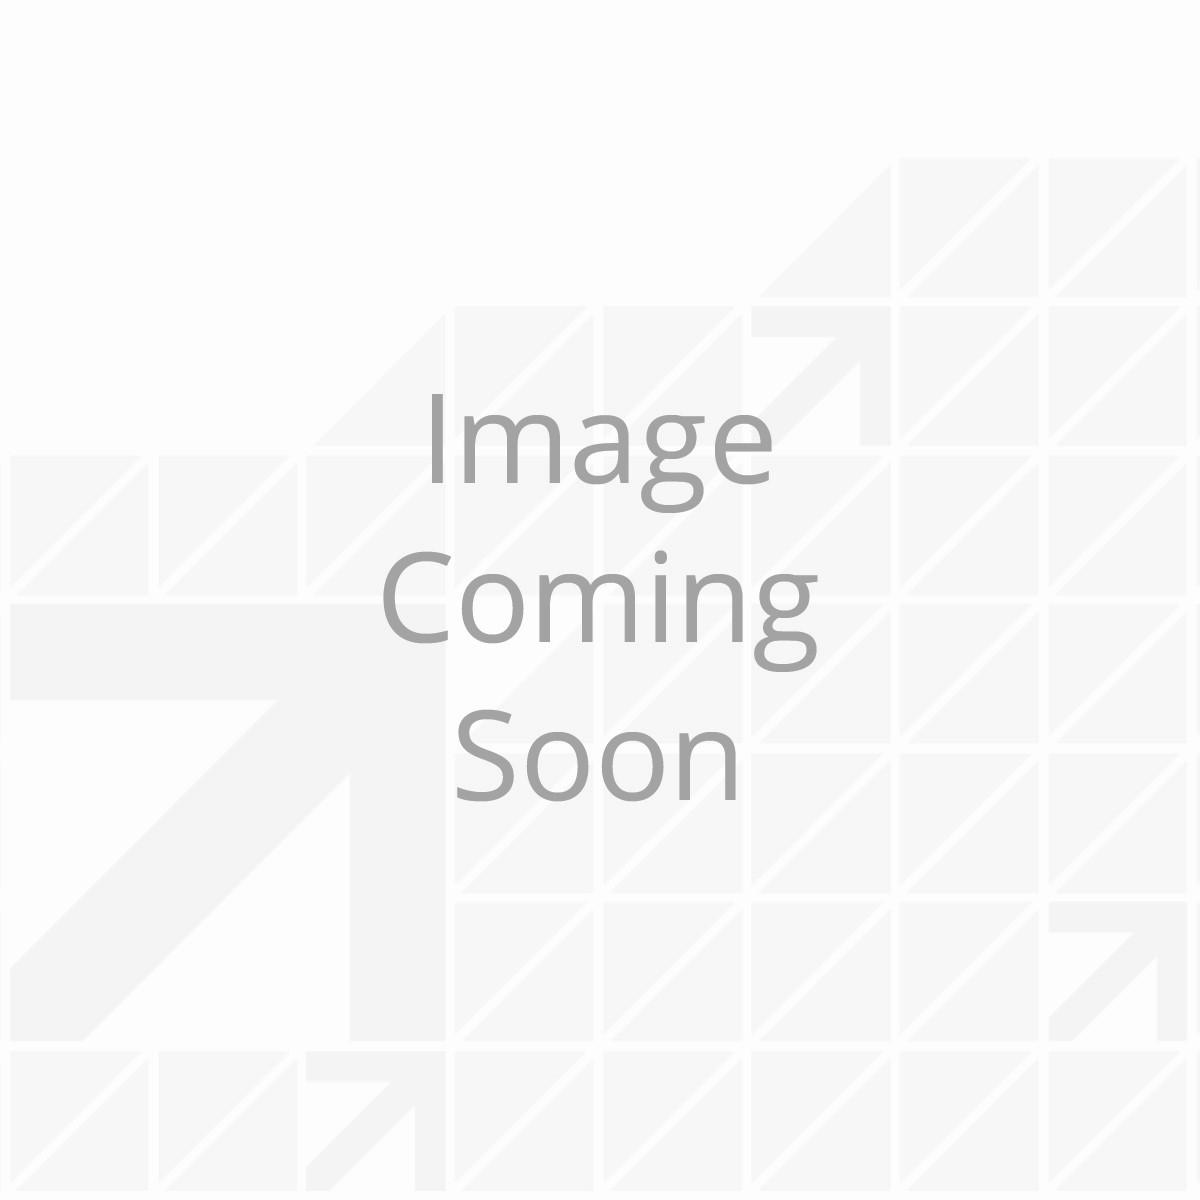 "Forward Self-Adjusting Brakes, 10"" x 2.25""; 3,500 lbs.- Right Side"